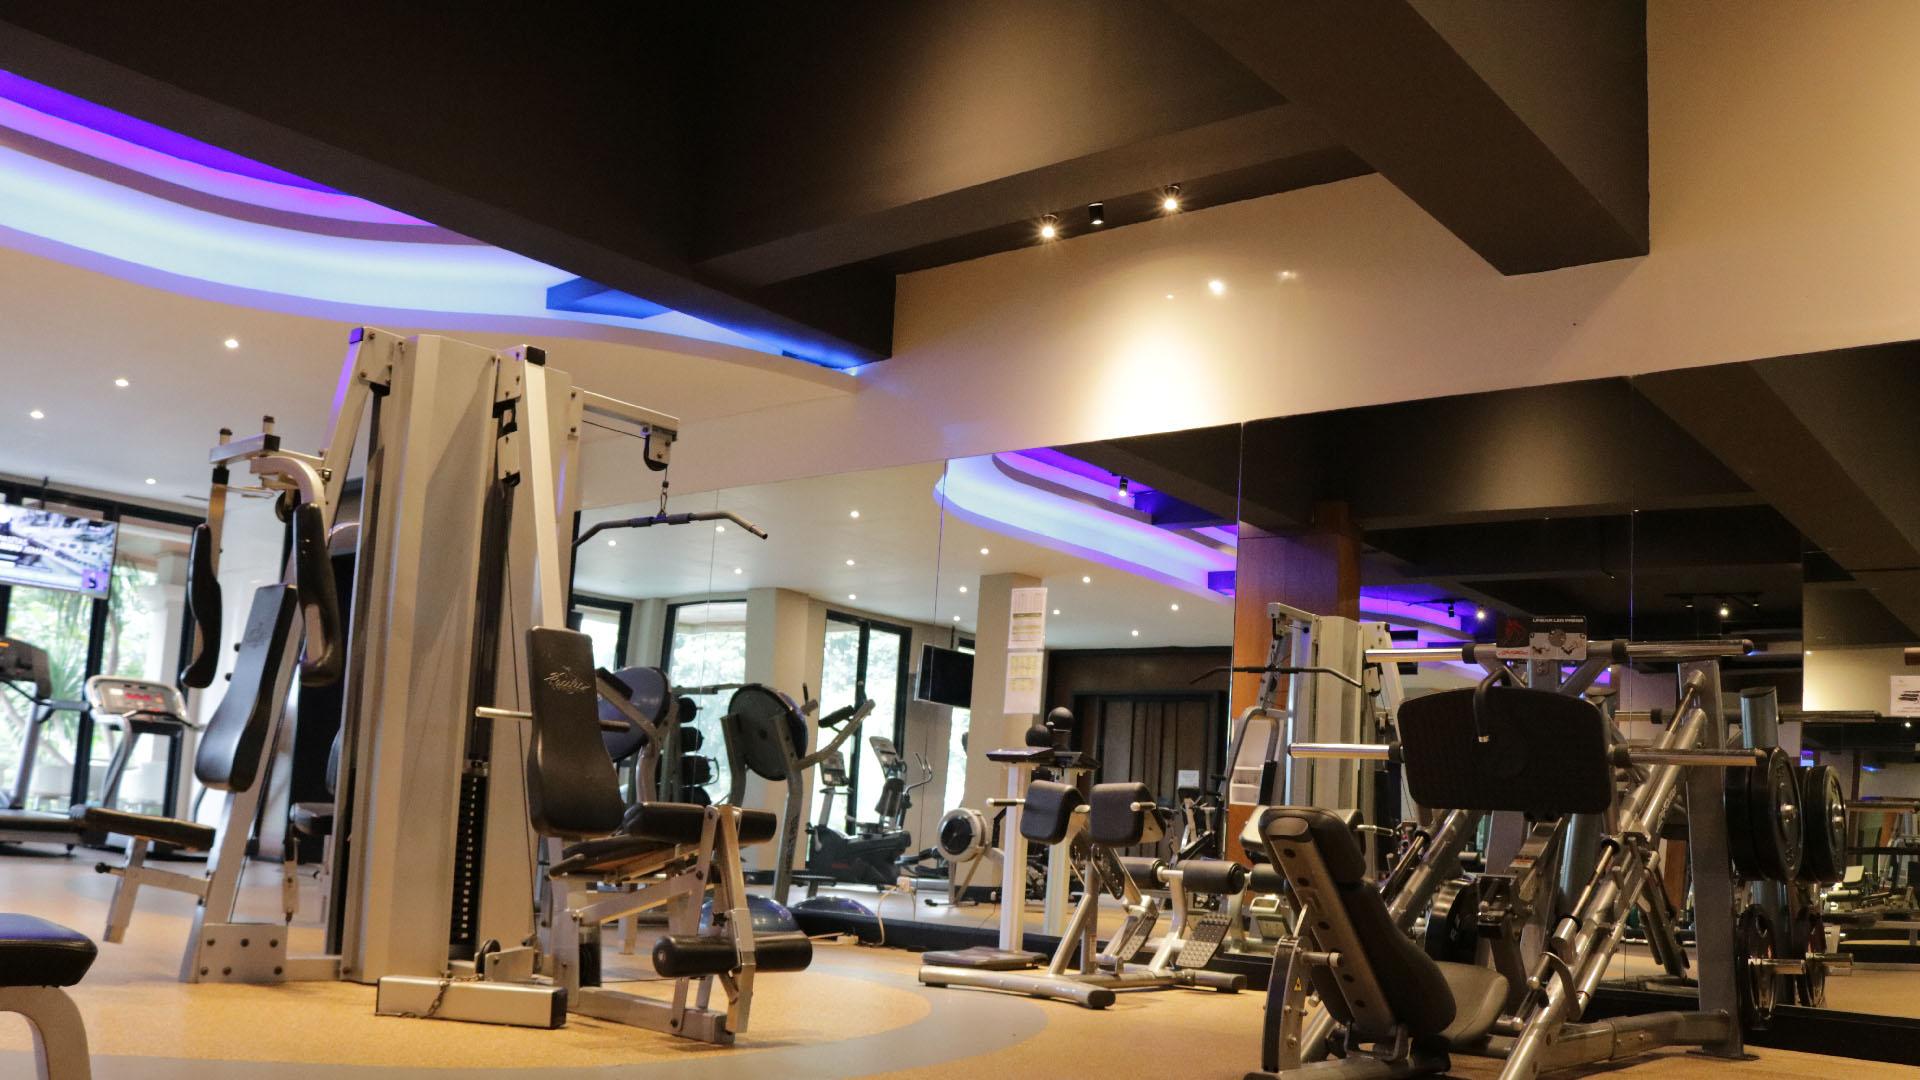 Gym & Pool - Membership - Slider-4